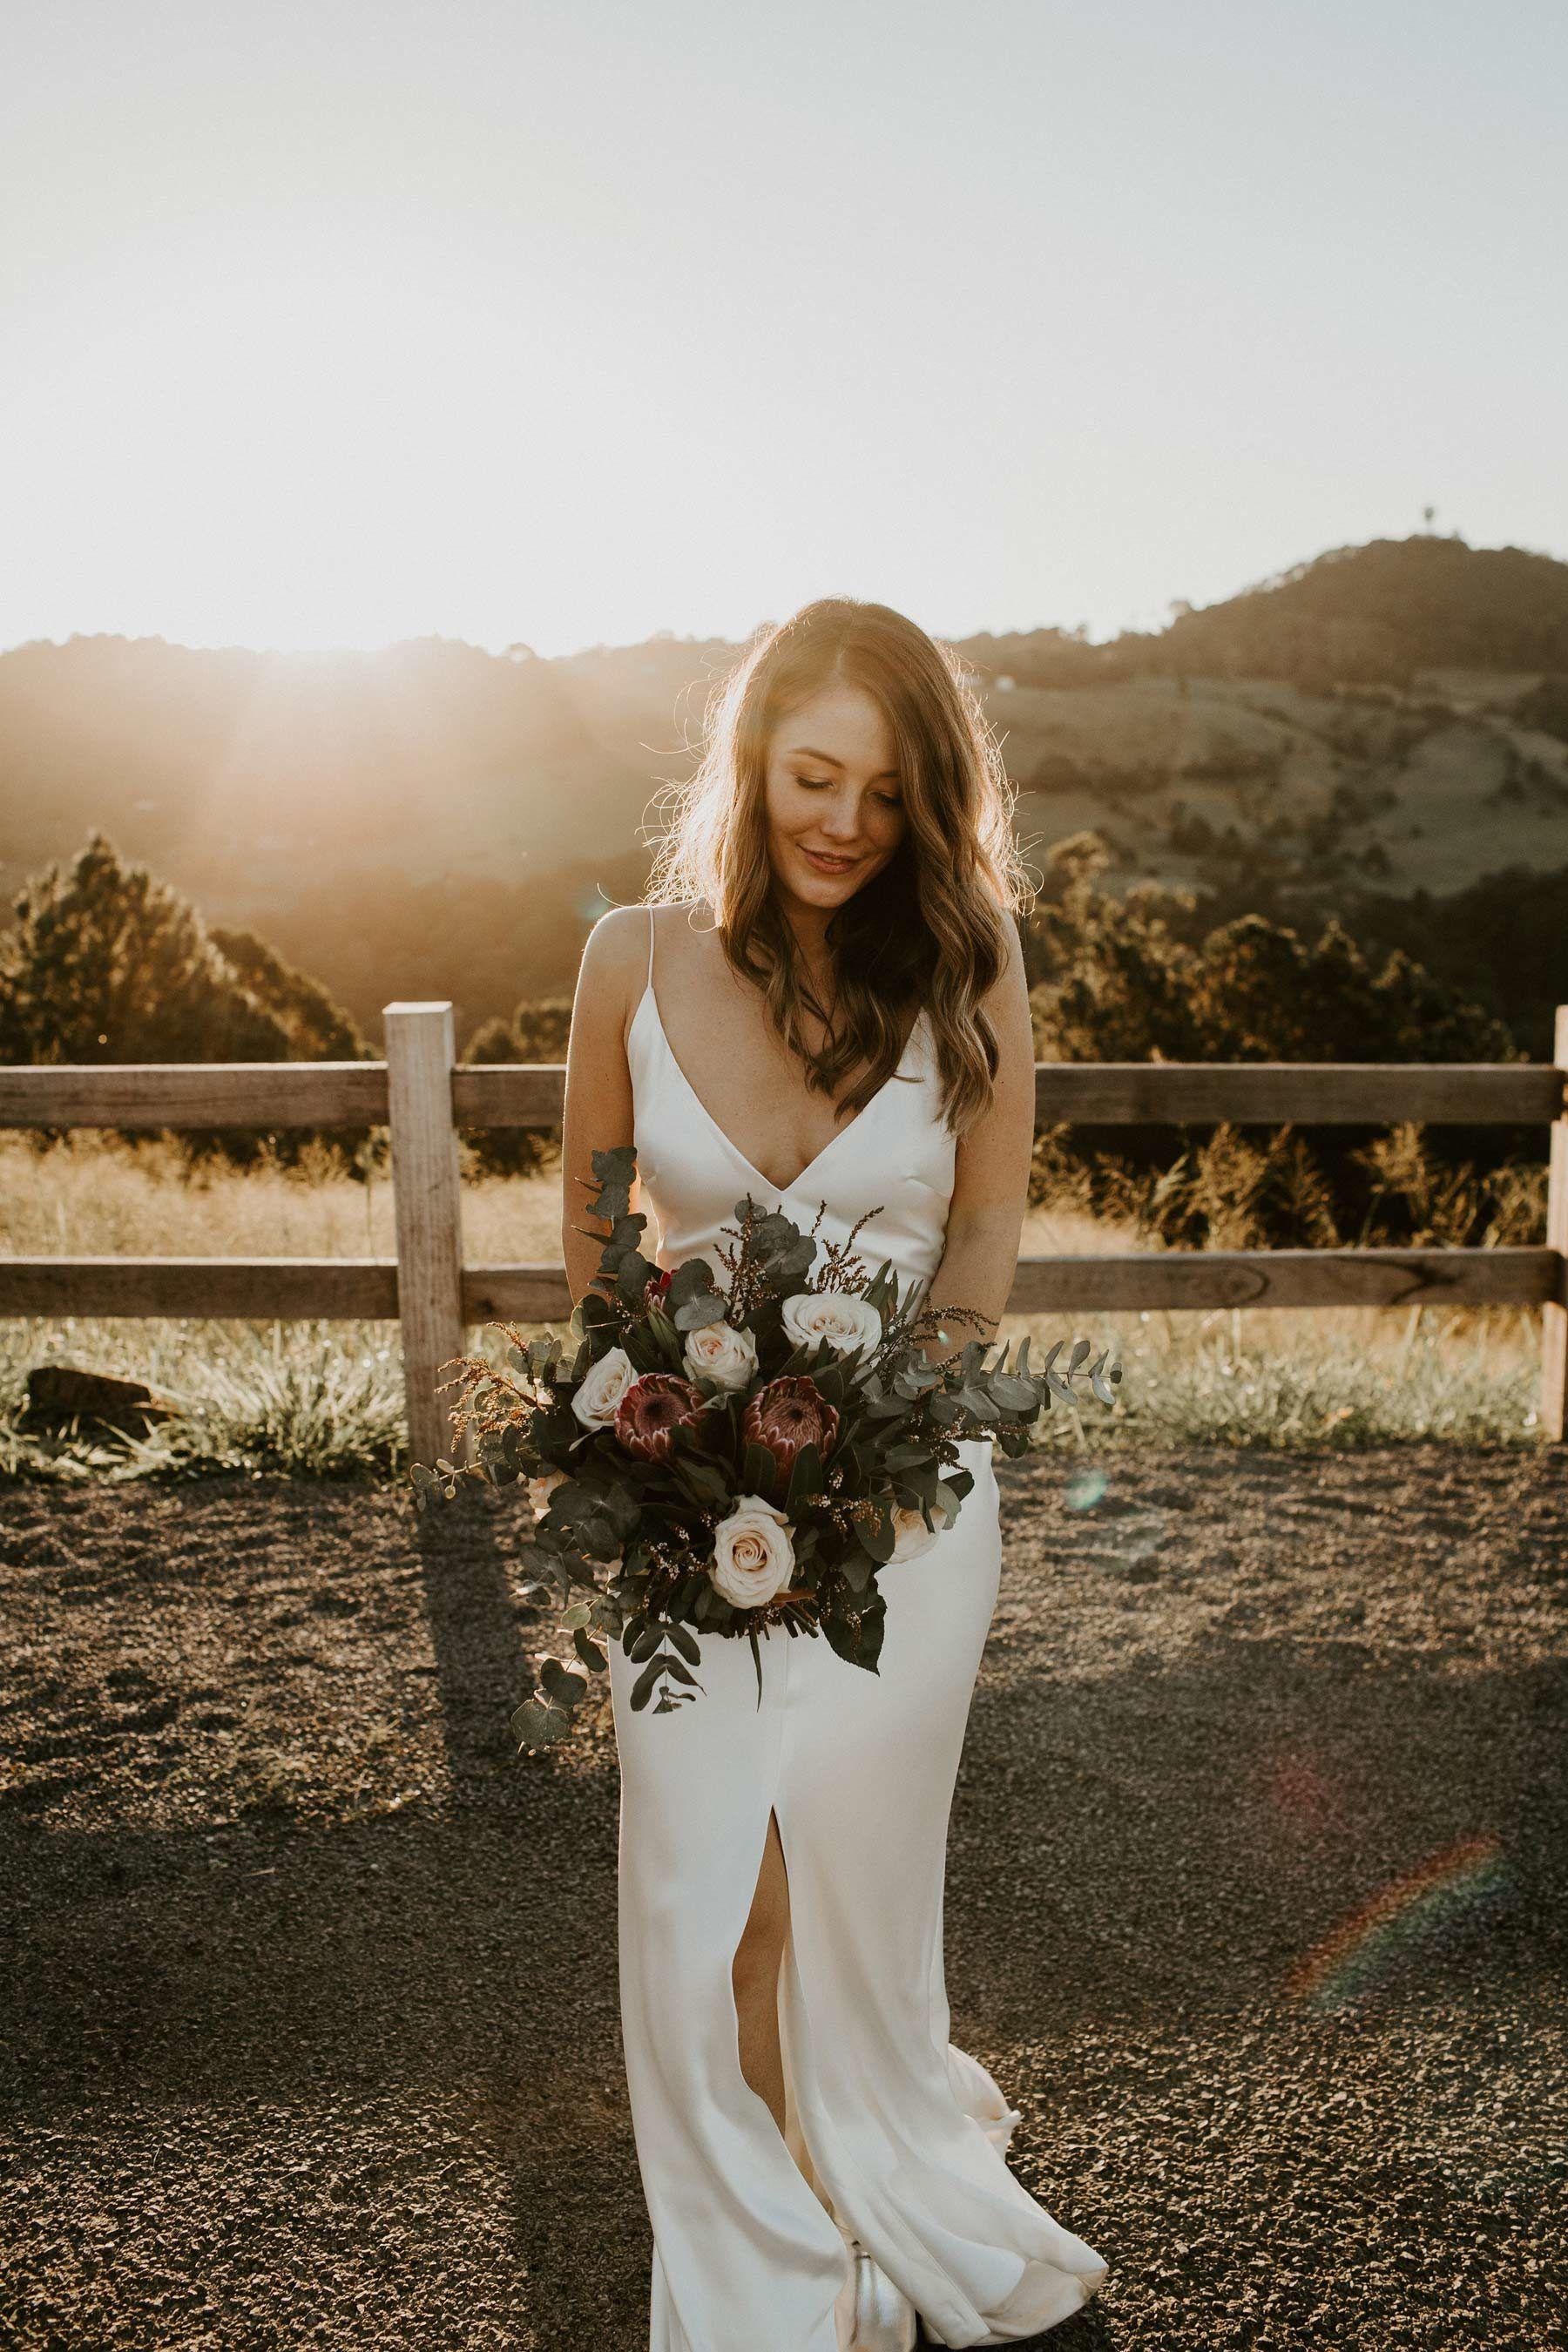 Jacinta & Daniel's Summergrove Estate Wedding (Planned in